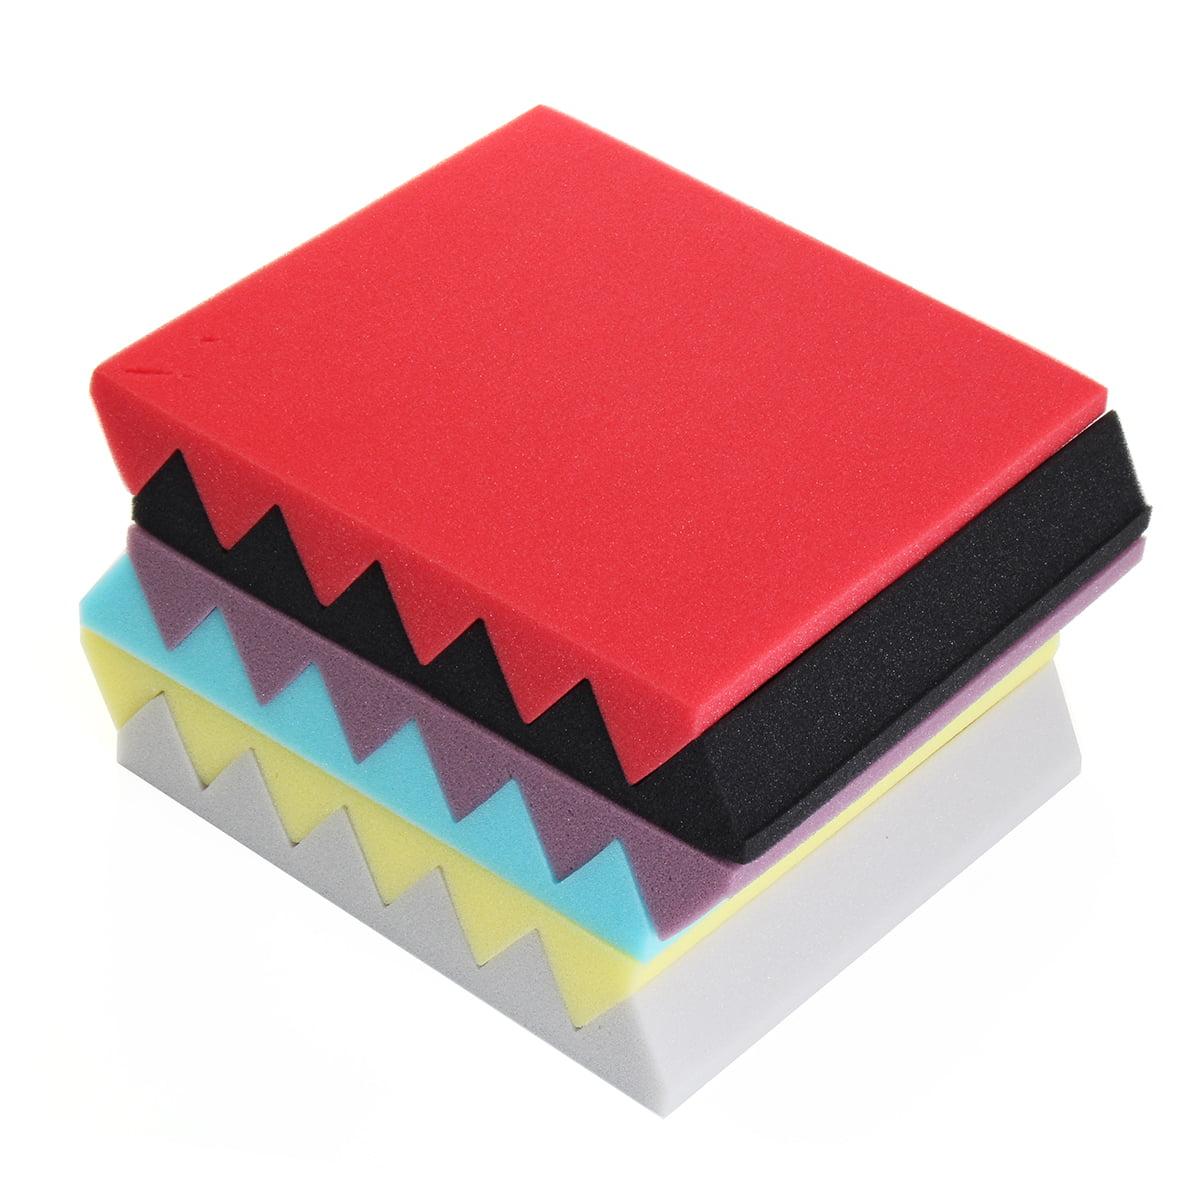 Wedge Acoustic Studio Sponge Soundproofing Foam Wall Tiles 12''x12''x2''